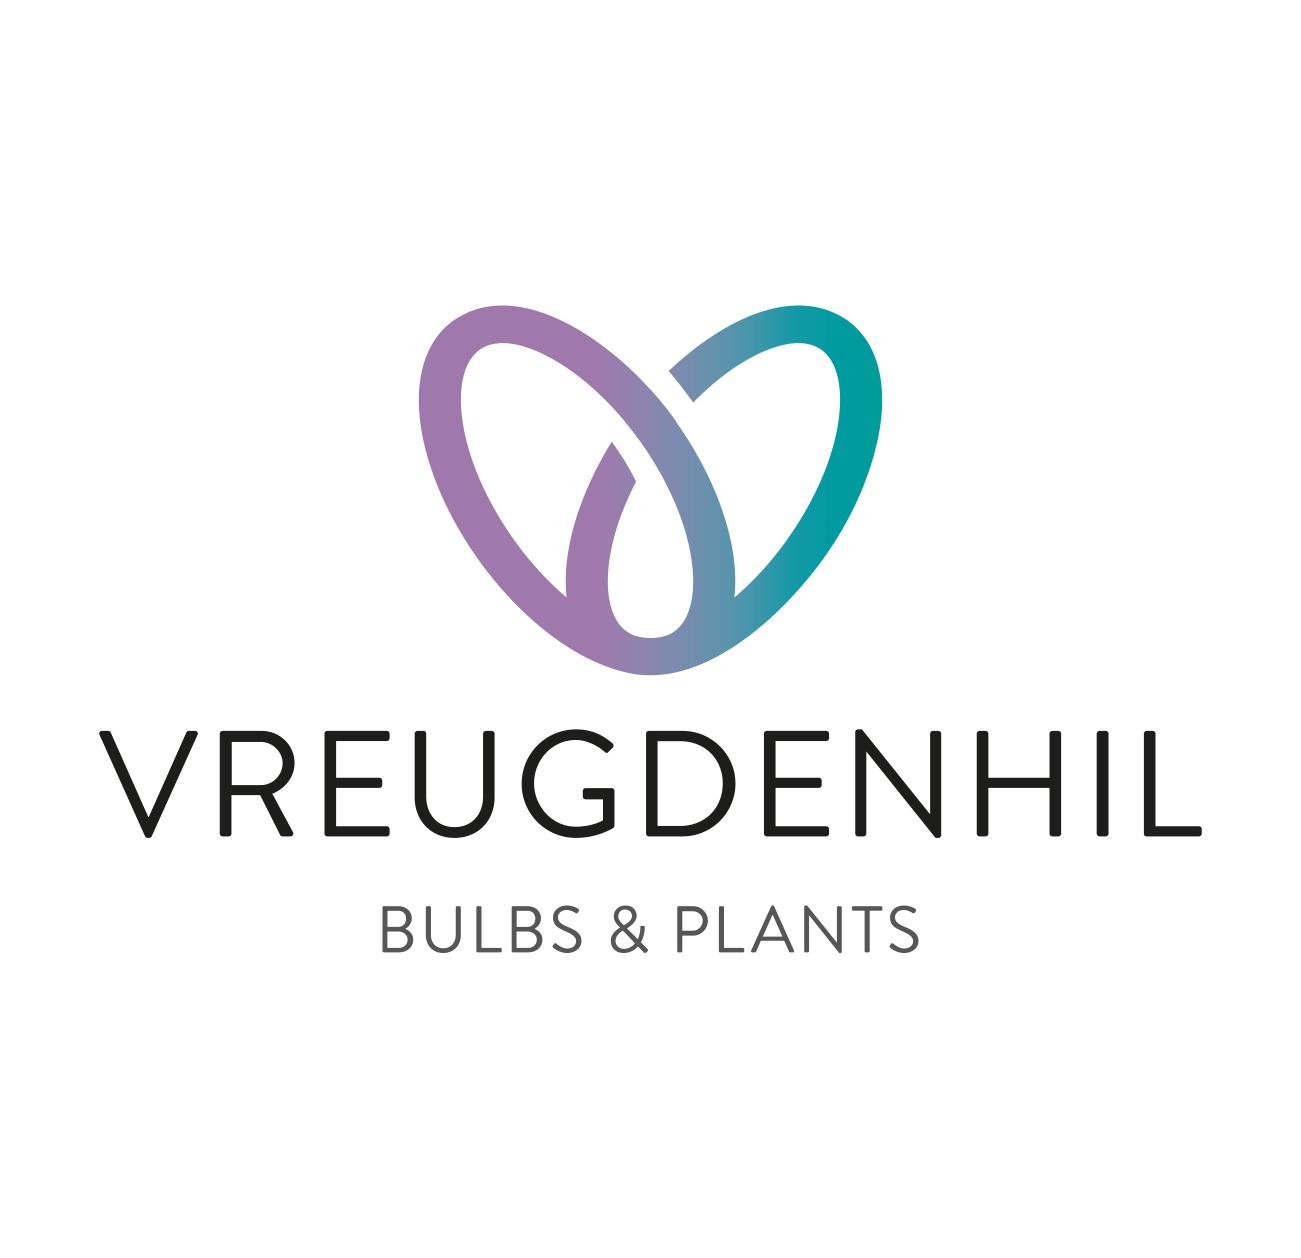 033_01_21 Vreugdenhil-logo